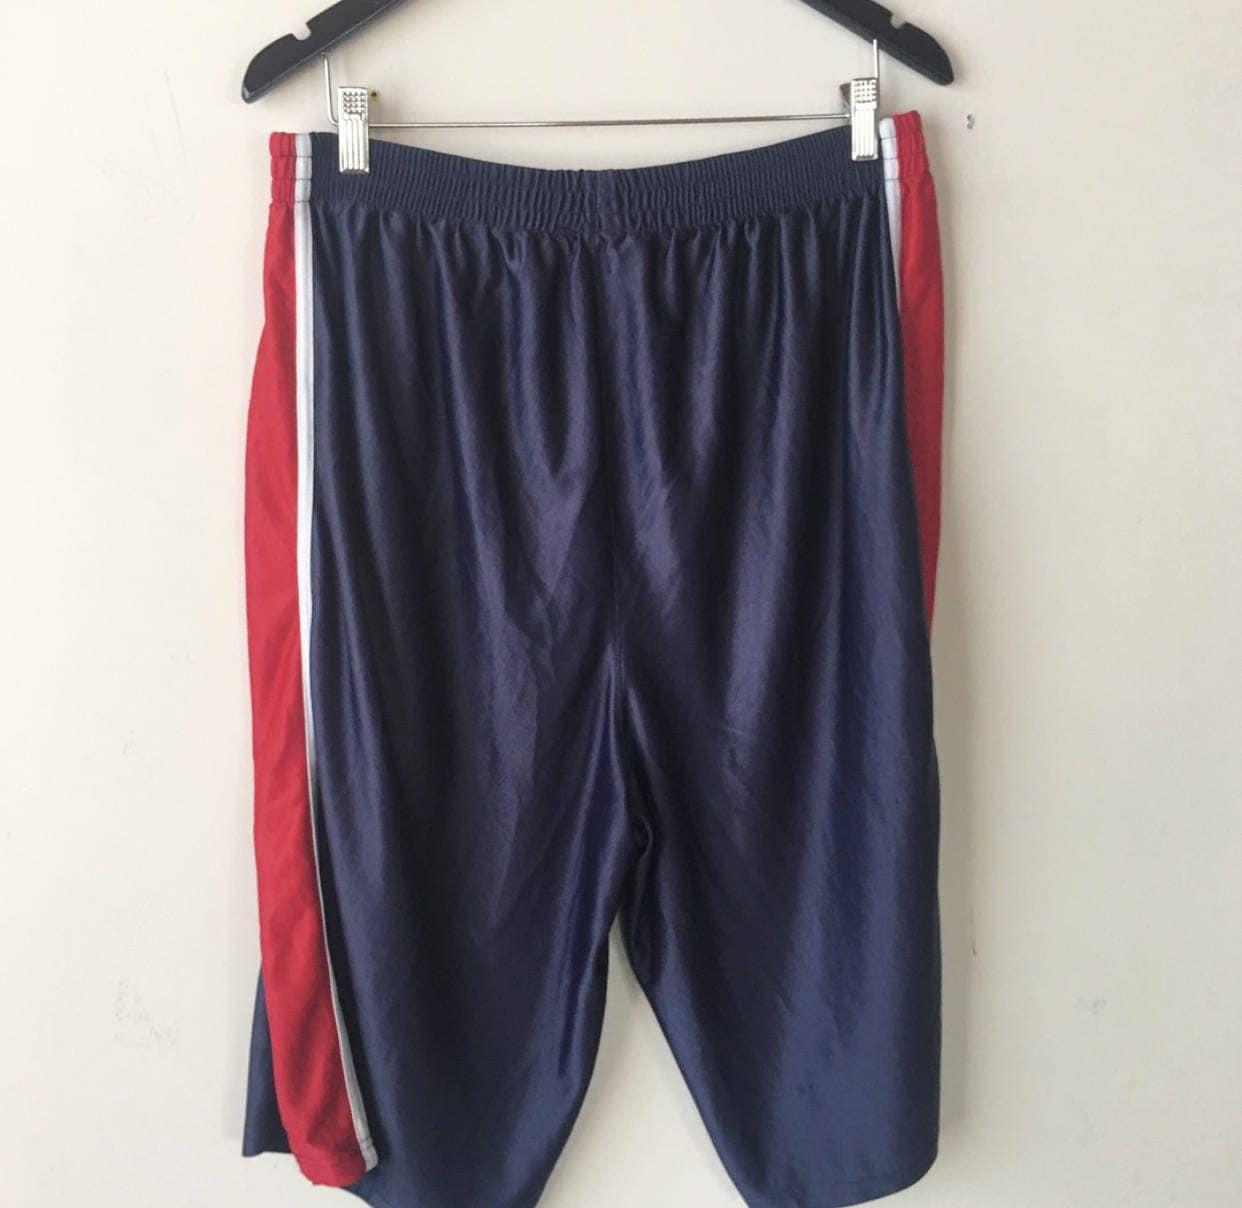 Vintage 90s NBA Shorts Sport Athletic Mens Clothing